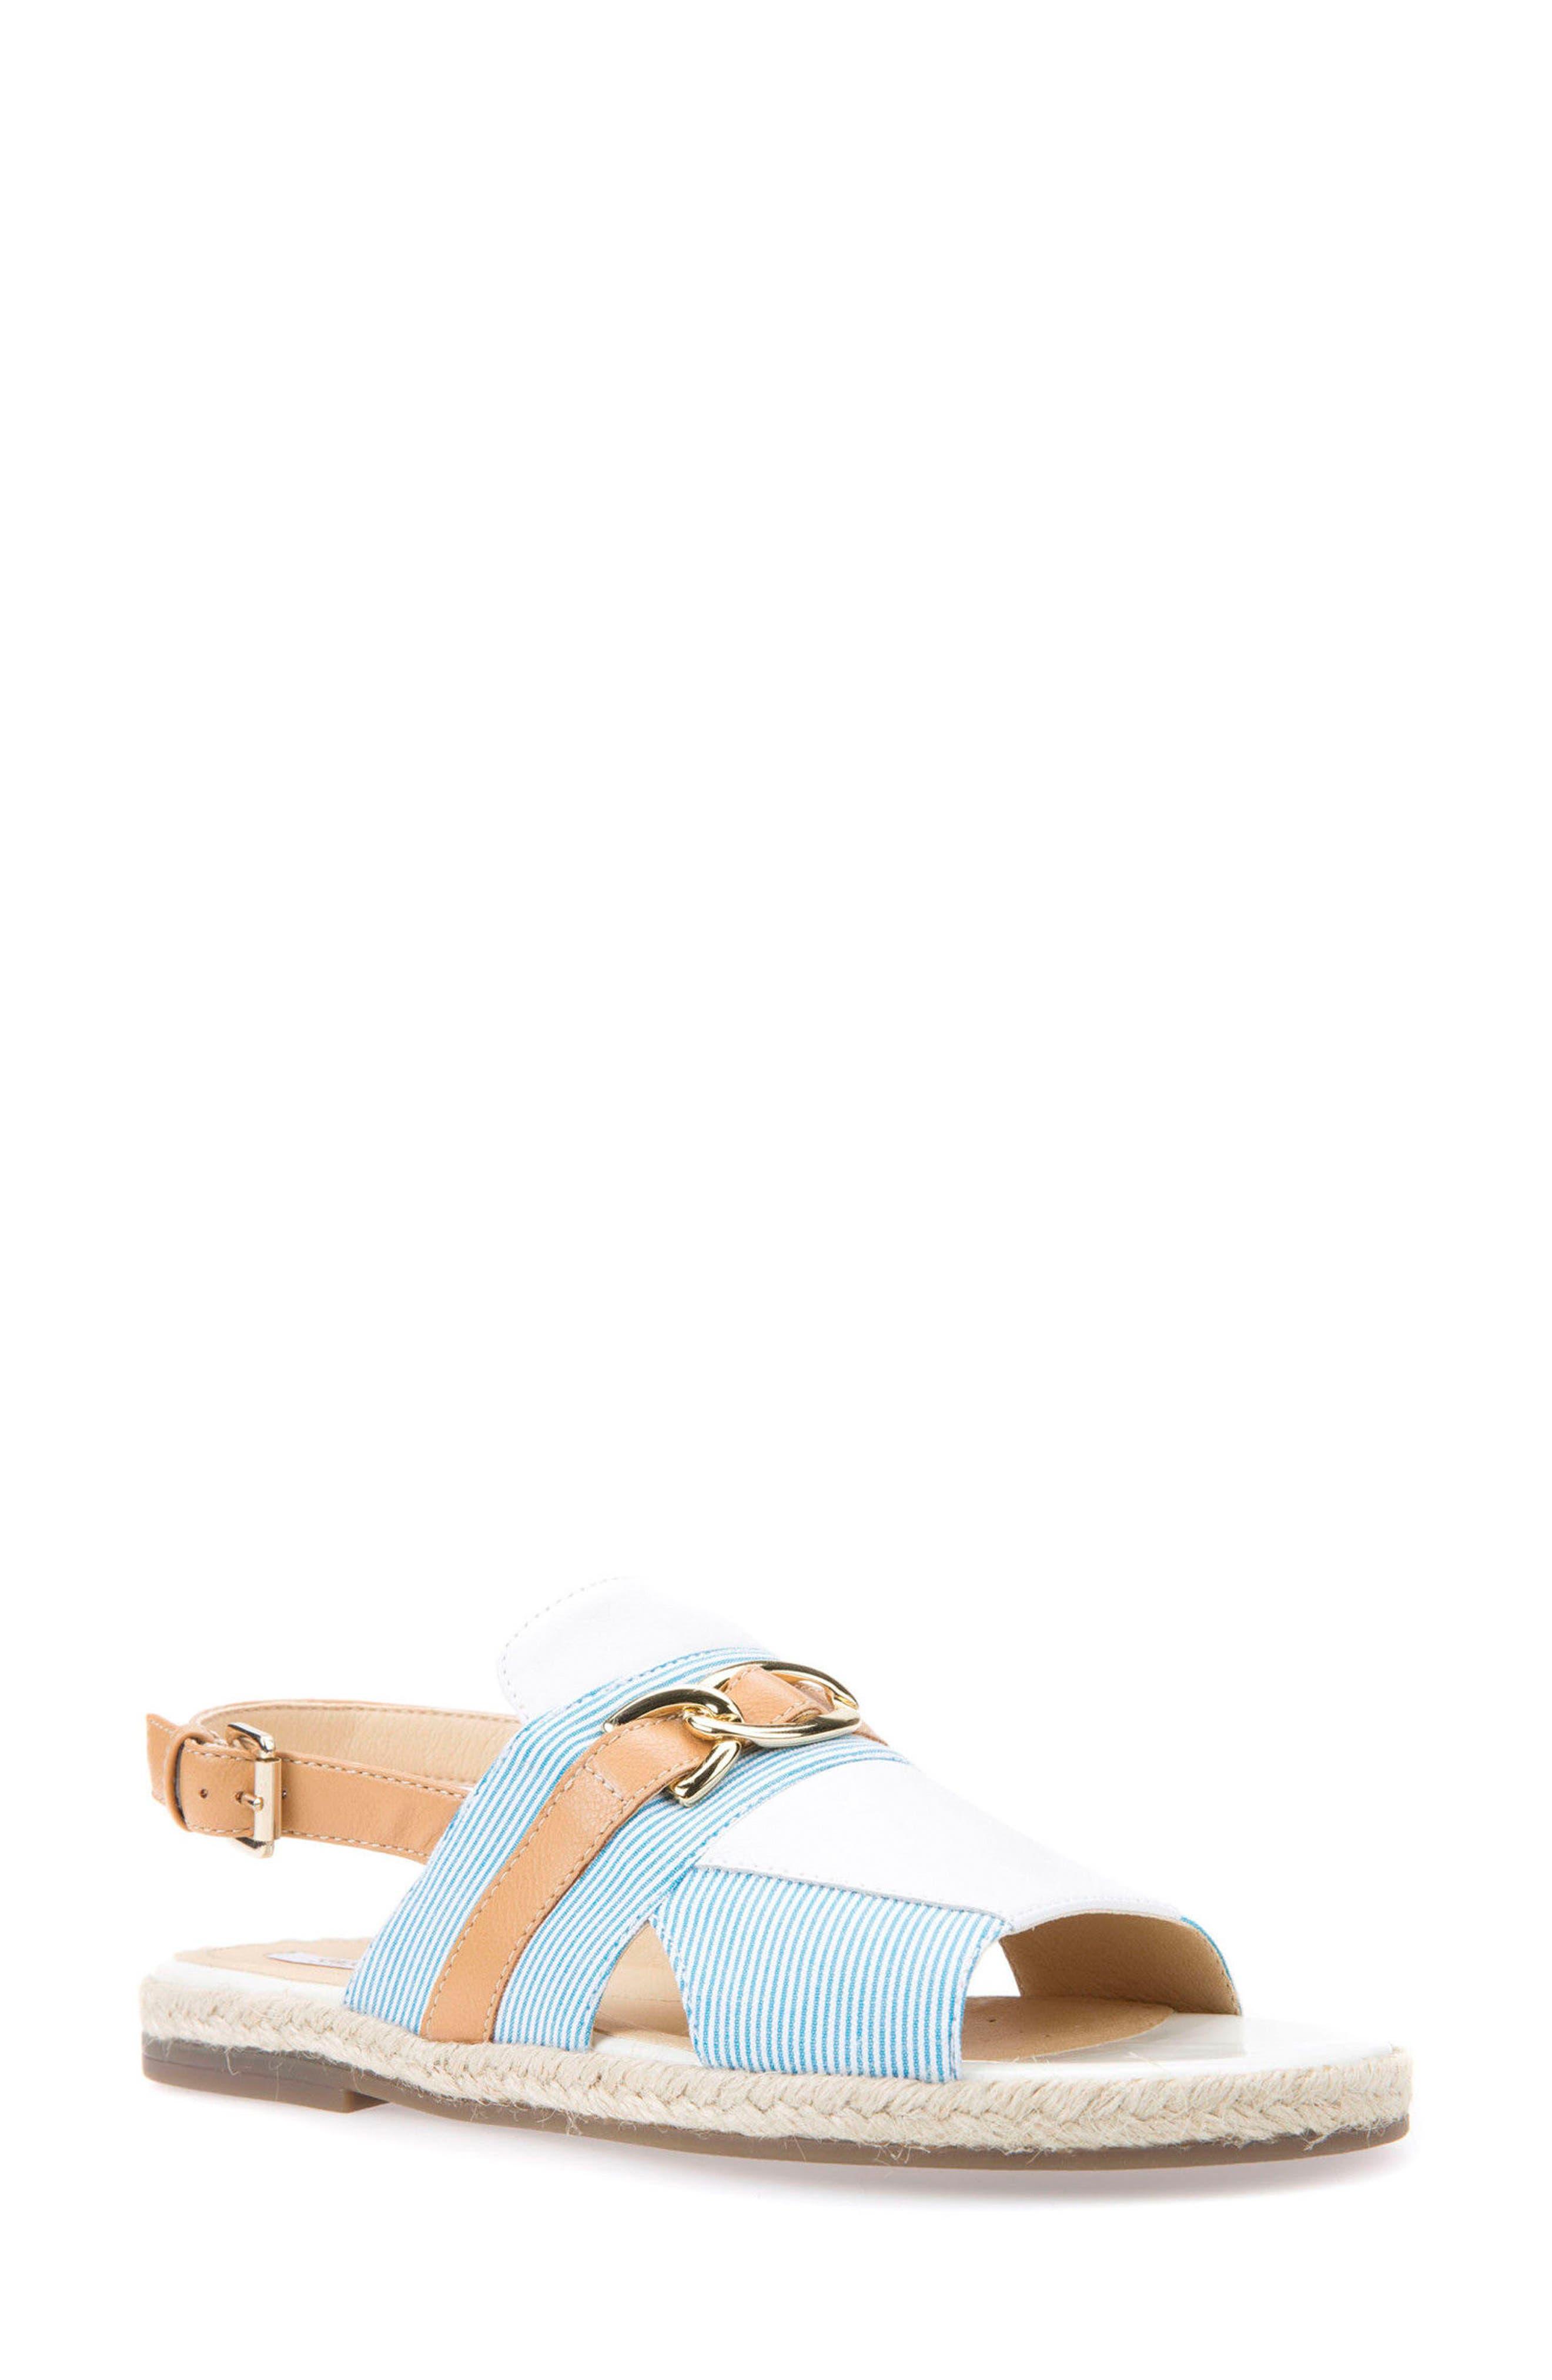 Kolleen Sandal,                         Main,                         color, 462